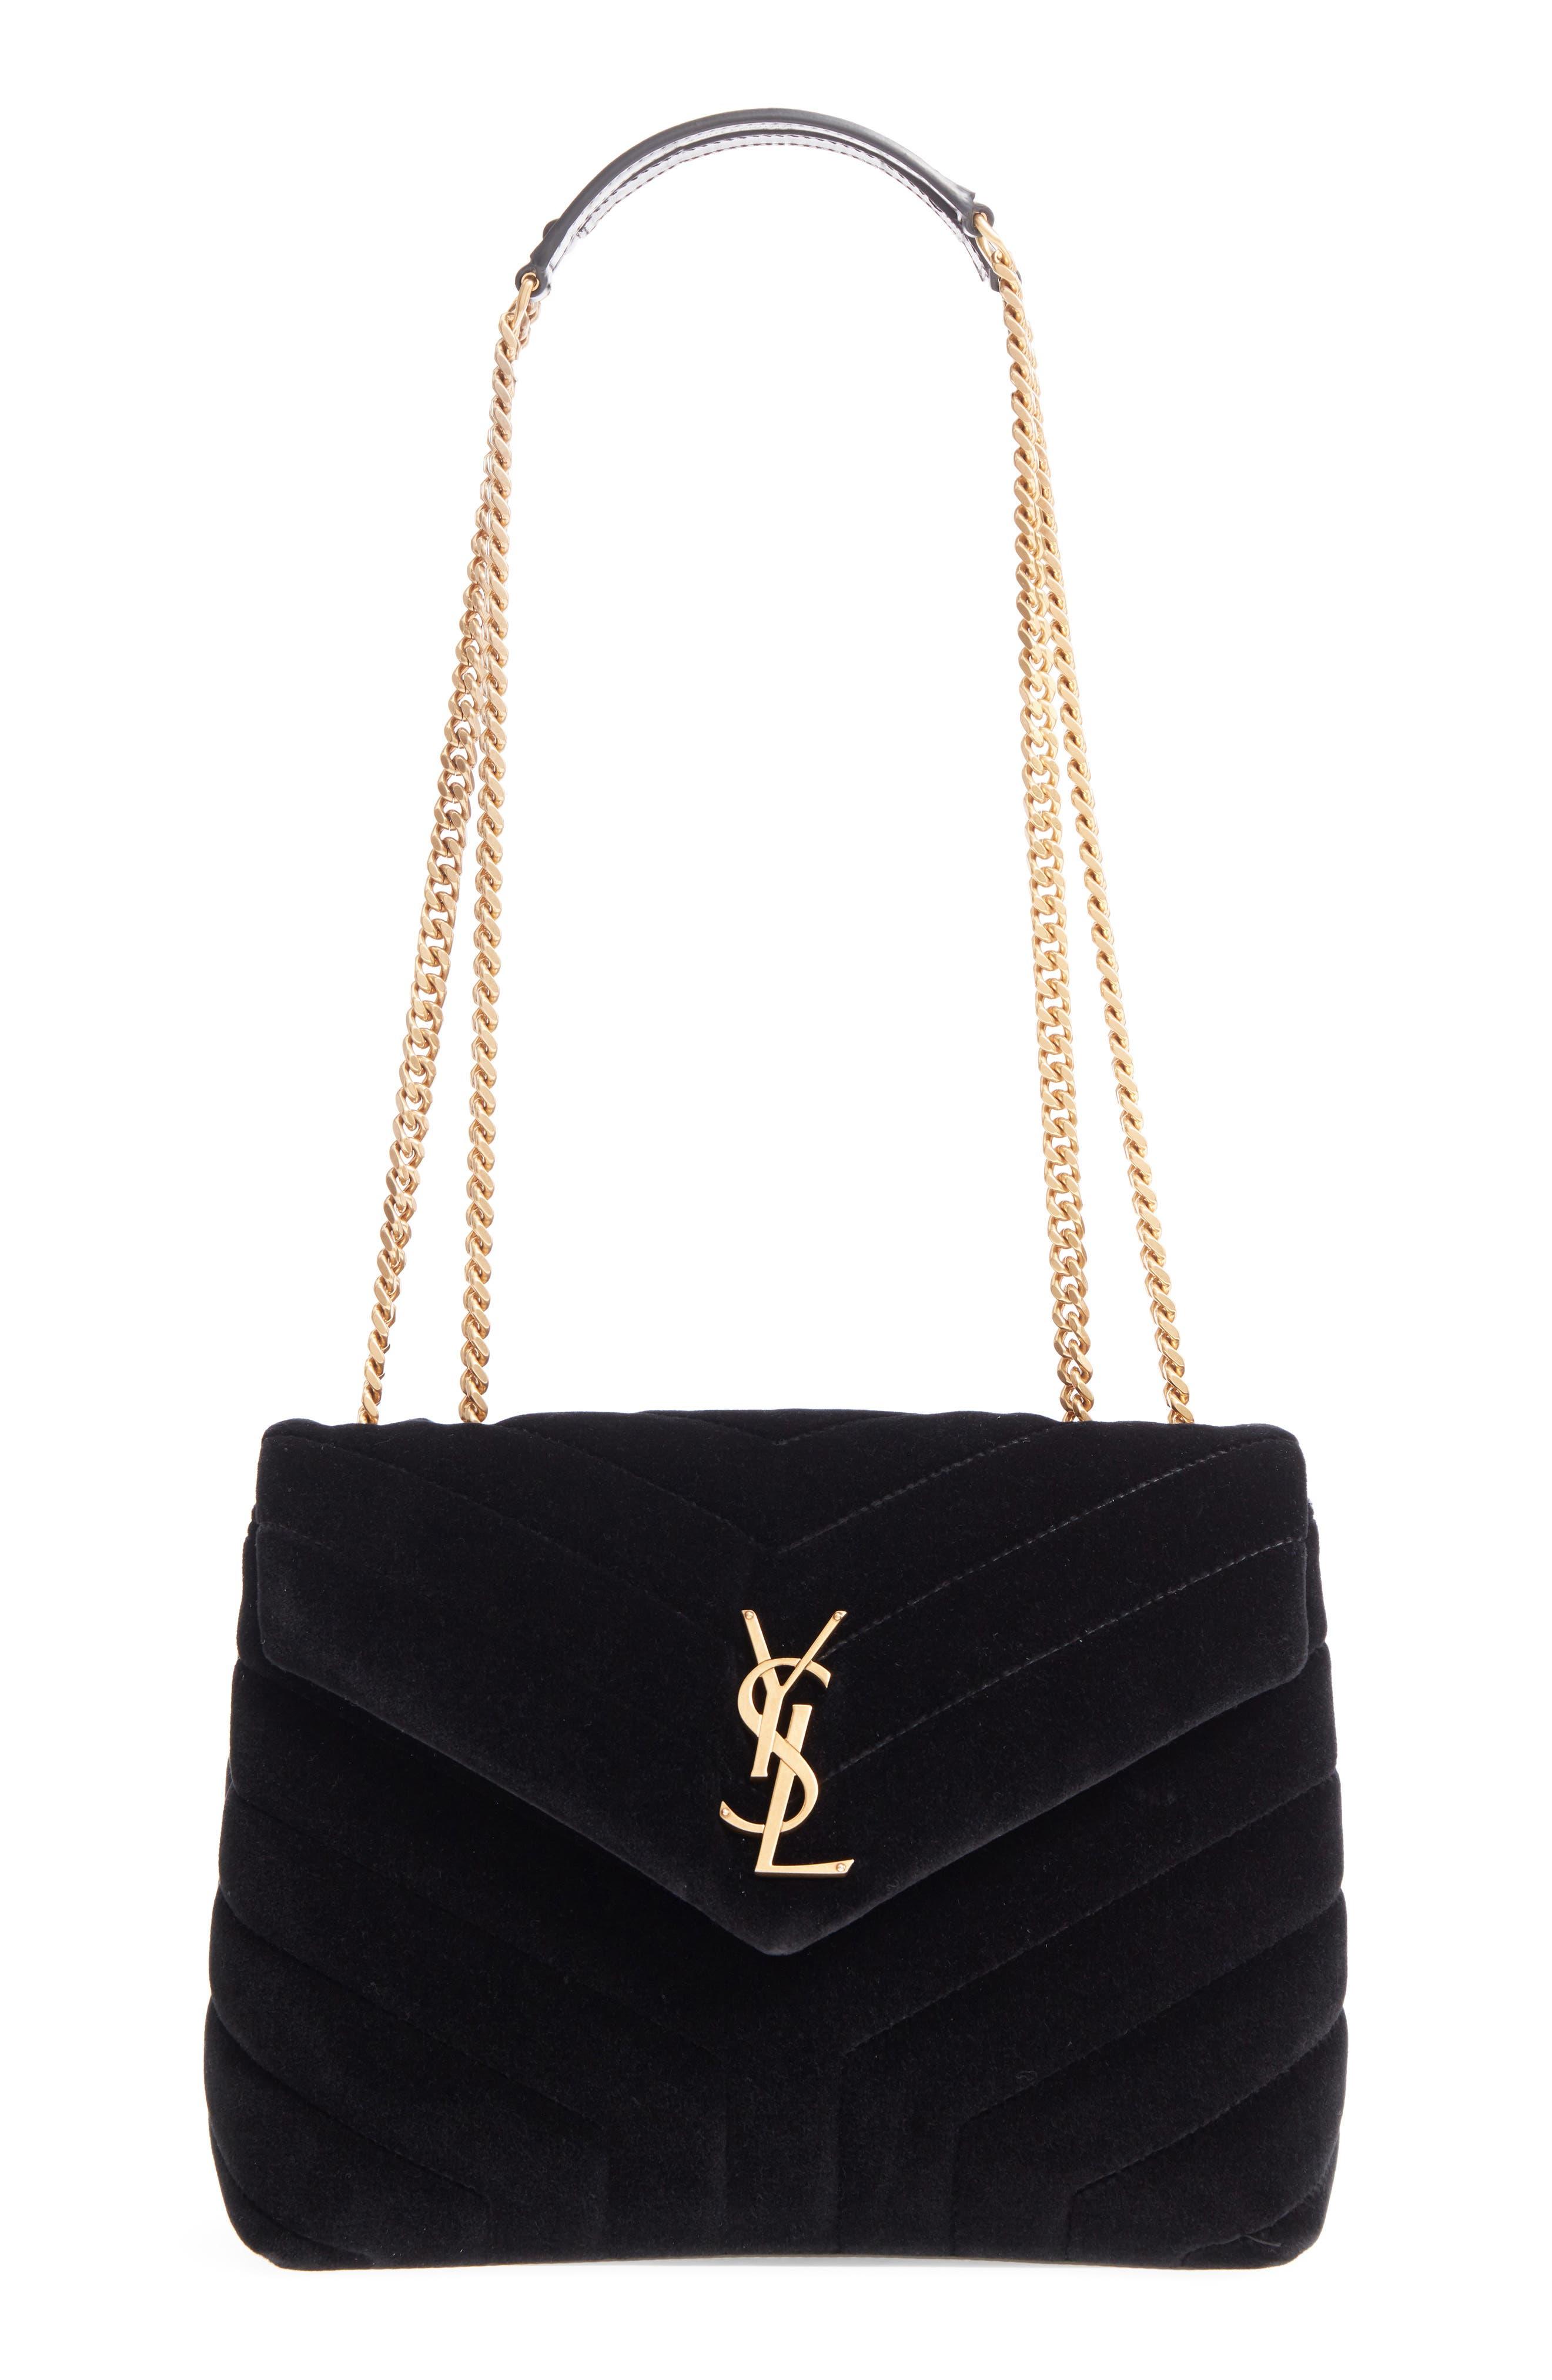 SAINT LAURENT Small Loulou Velvet Shoulder Bag, Main, color, NERO/ NERO/ NERO